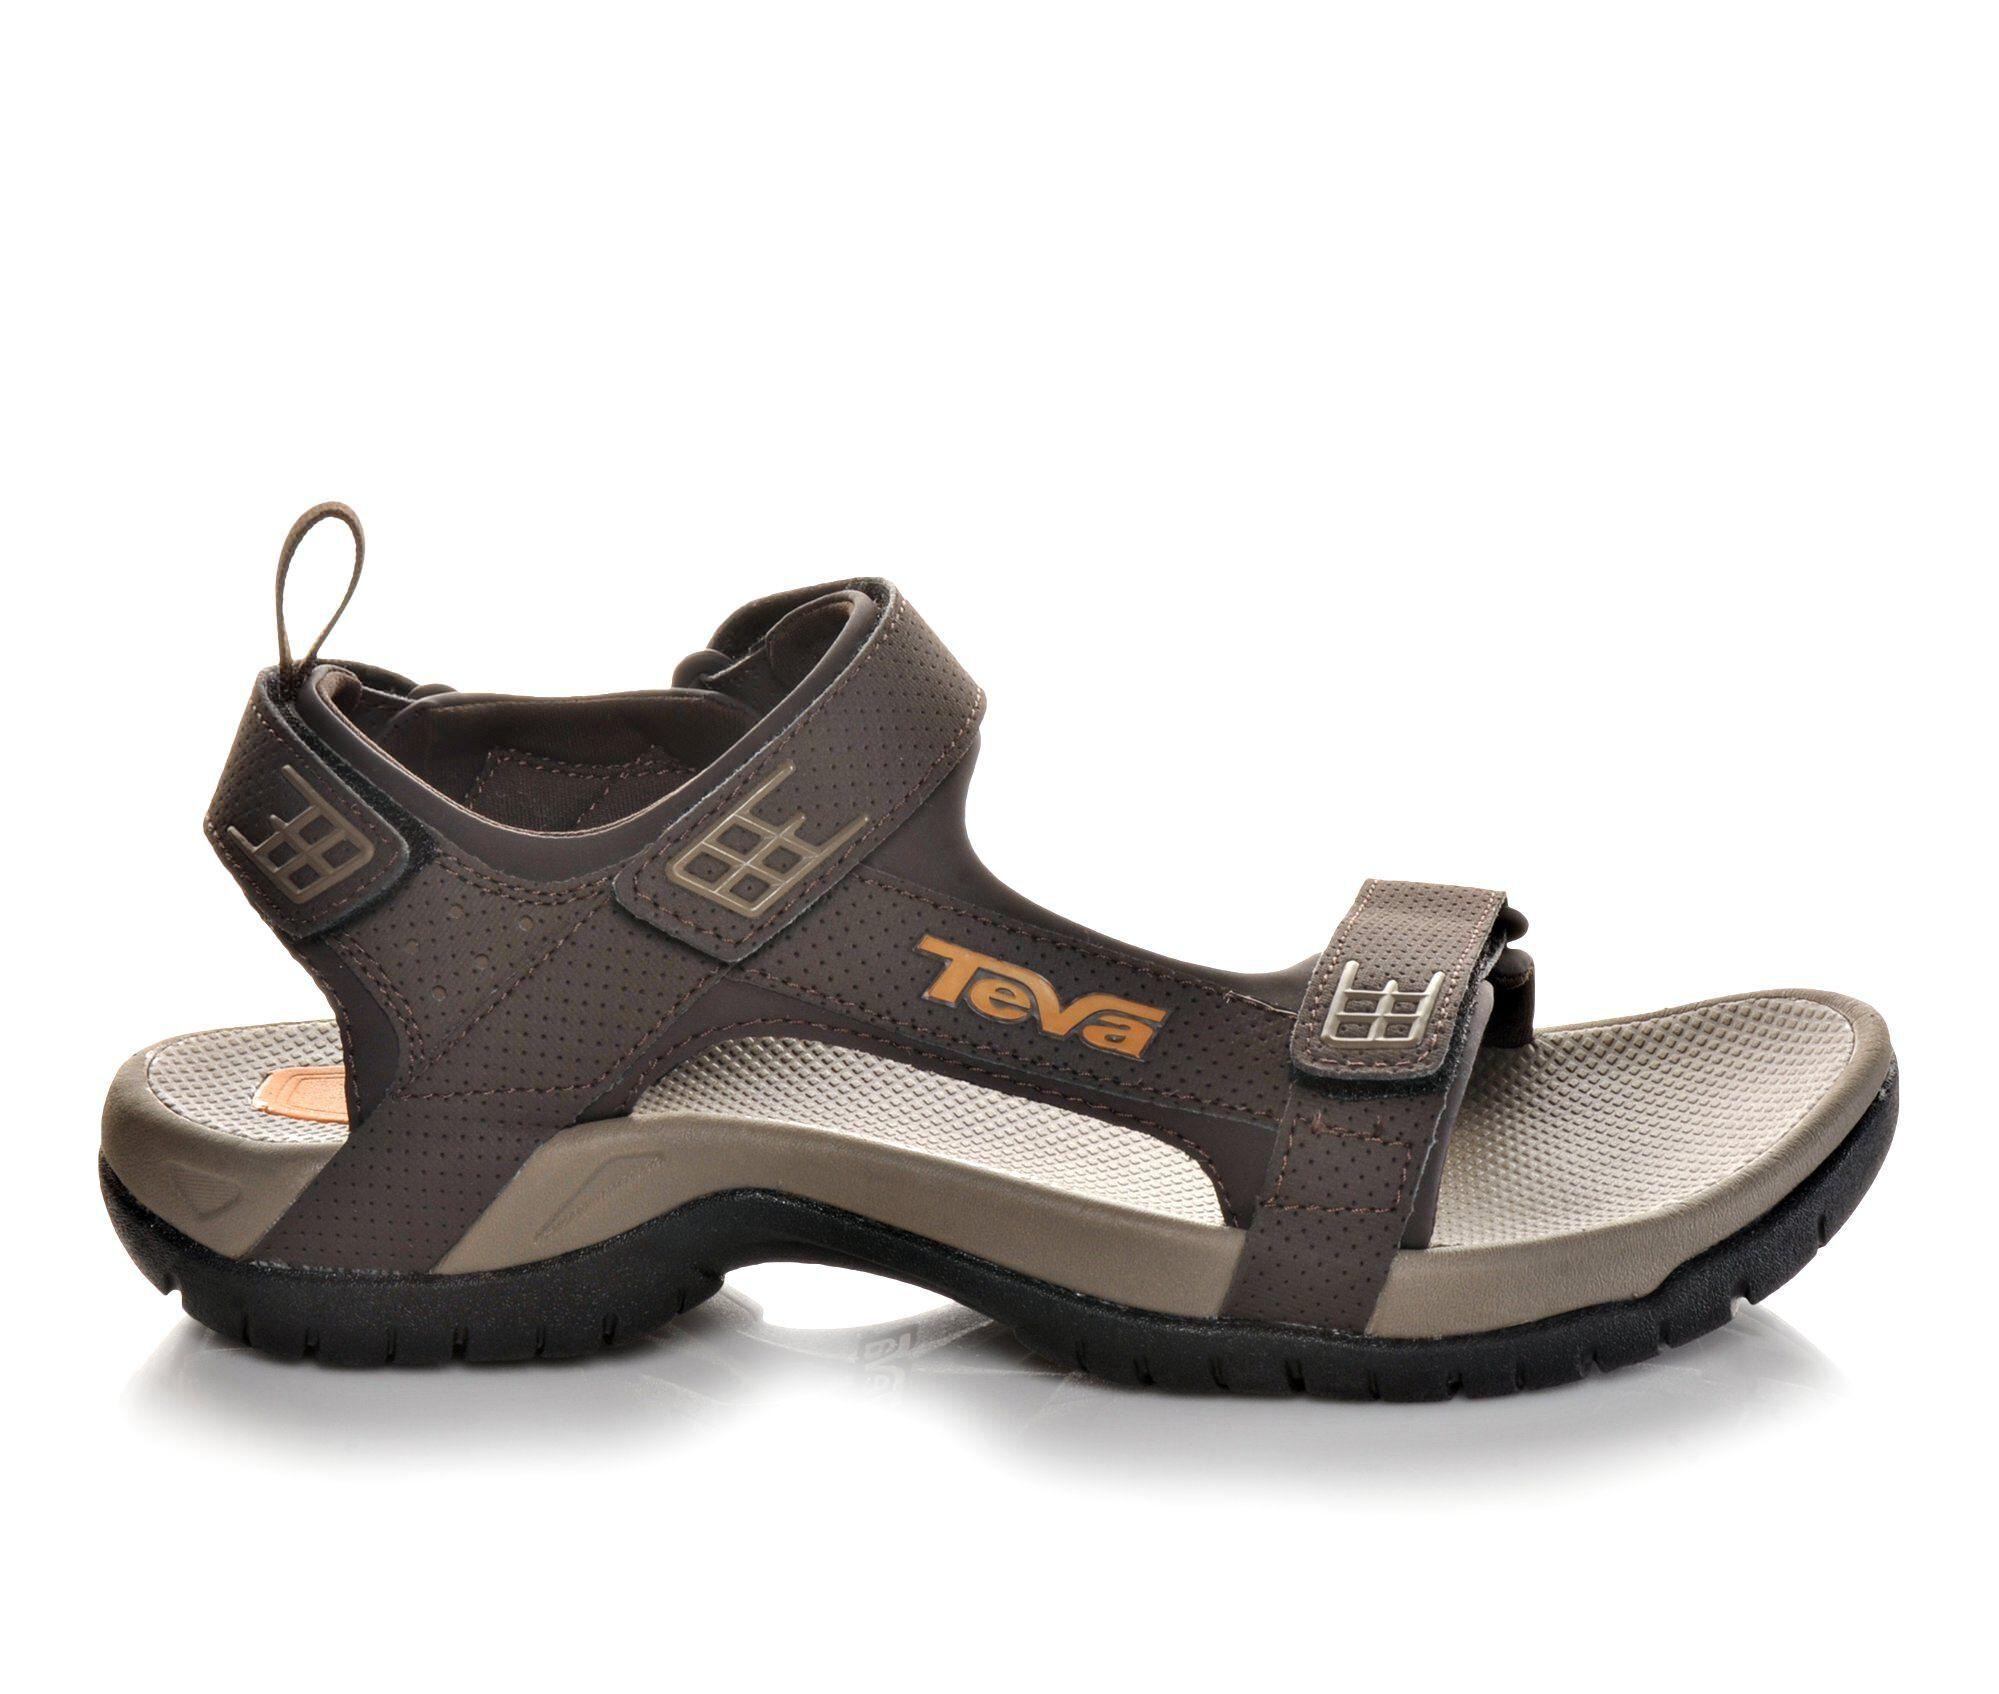 Men's Teva Minam Hiking Sandals Coffee